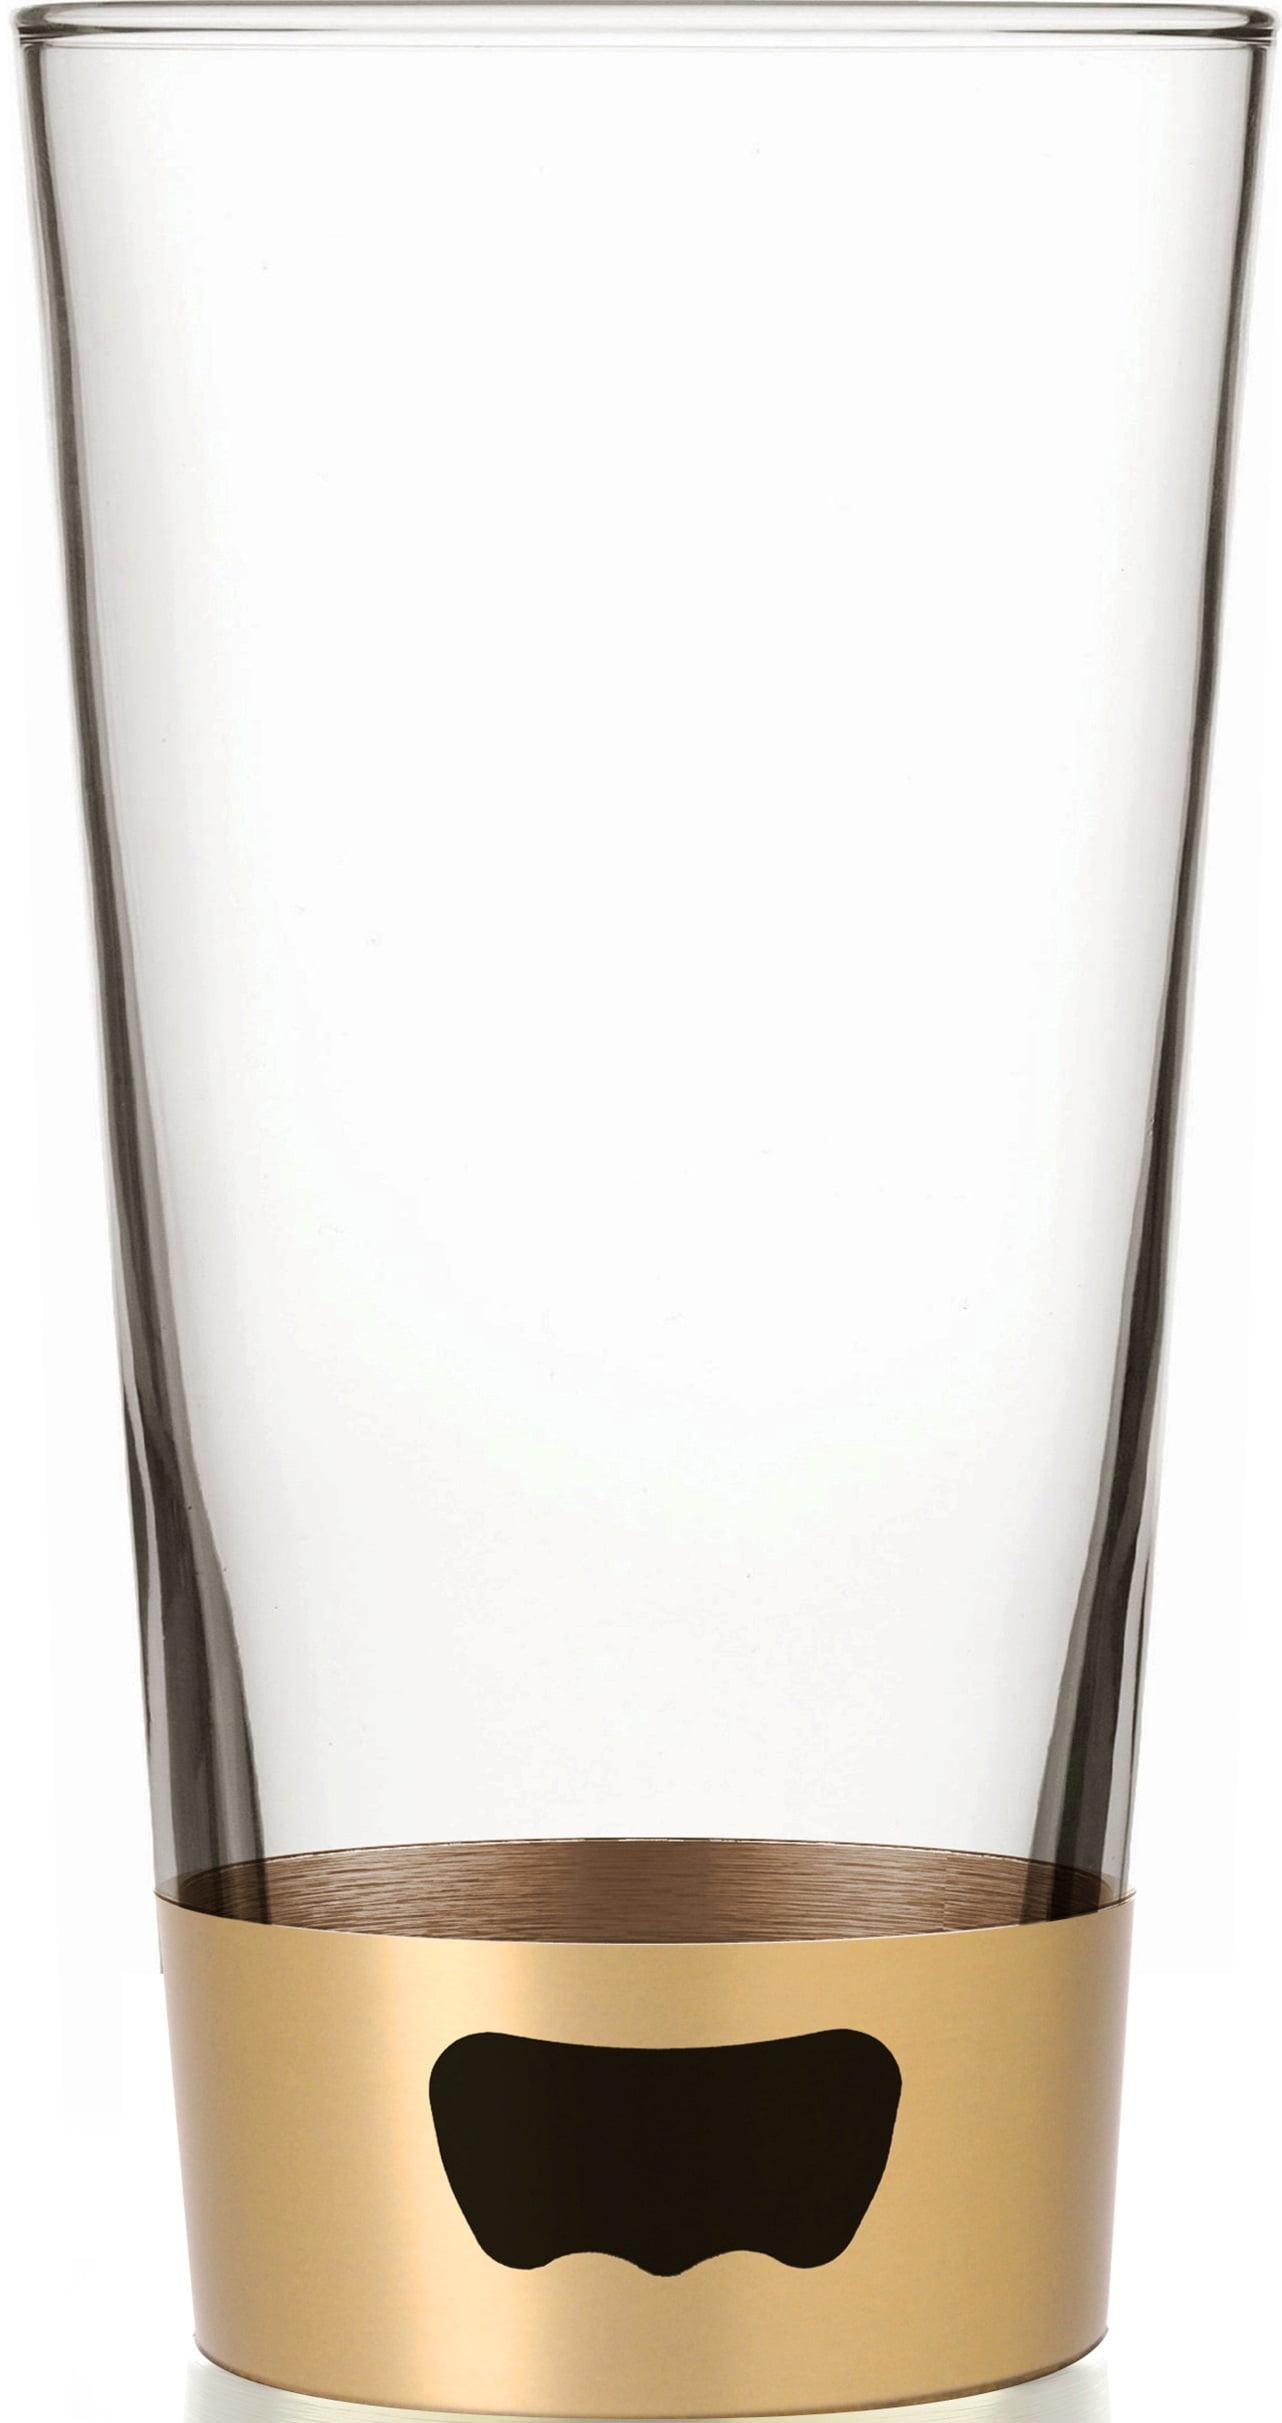 ASOBU Pint Glass Beer Mug with Beer Opener Base, Champagne 16 oz by AD-N-ART INC